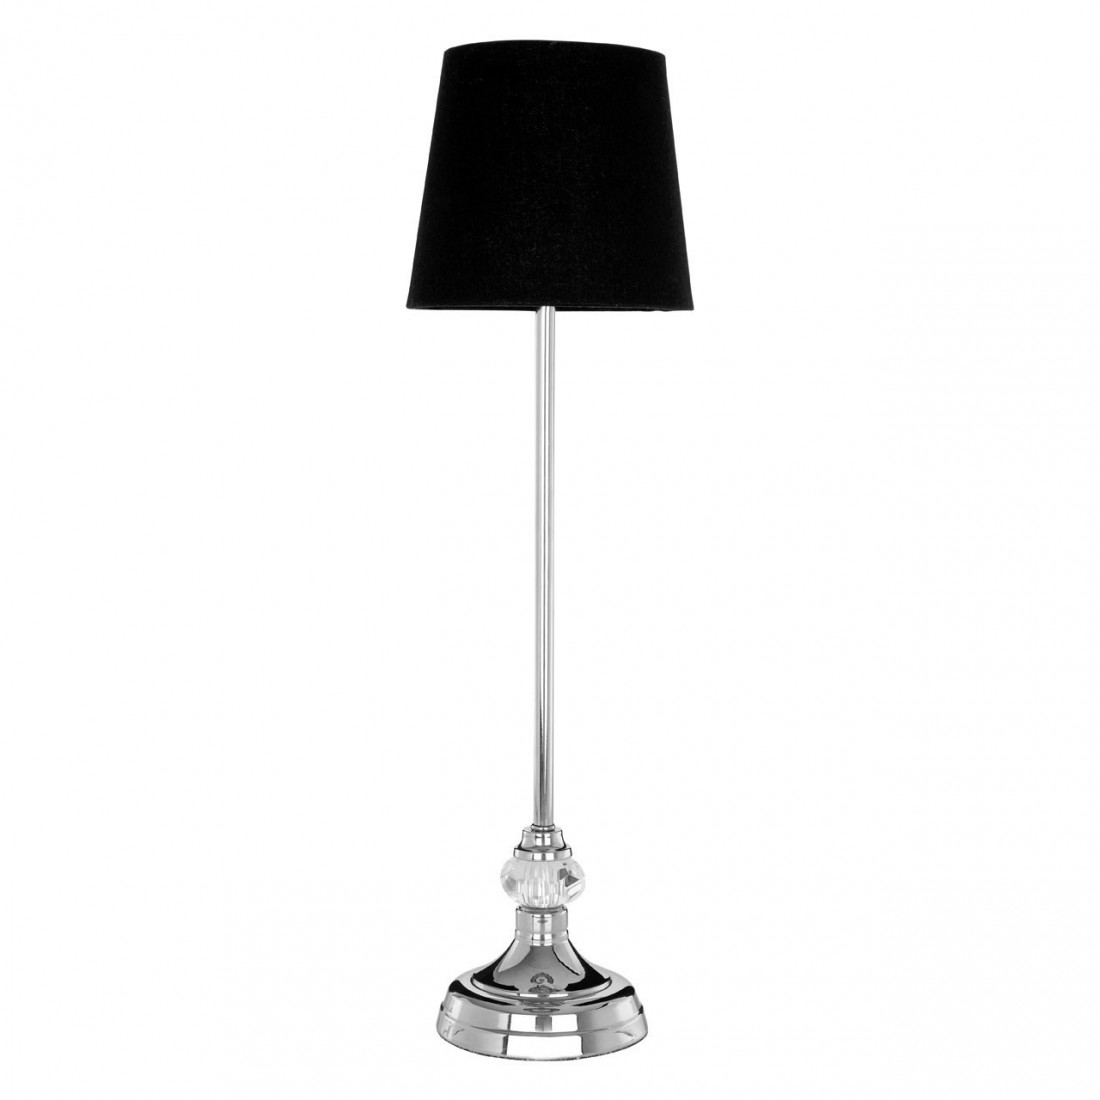 Kensington - Ursa stolní lampa